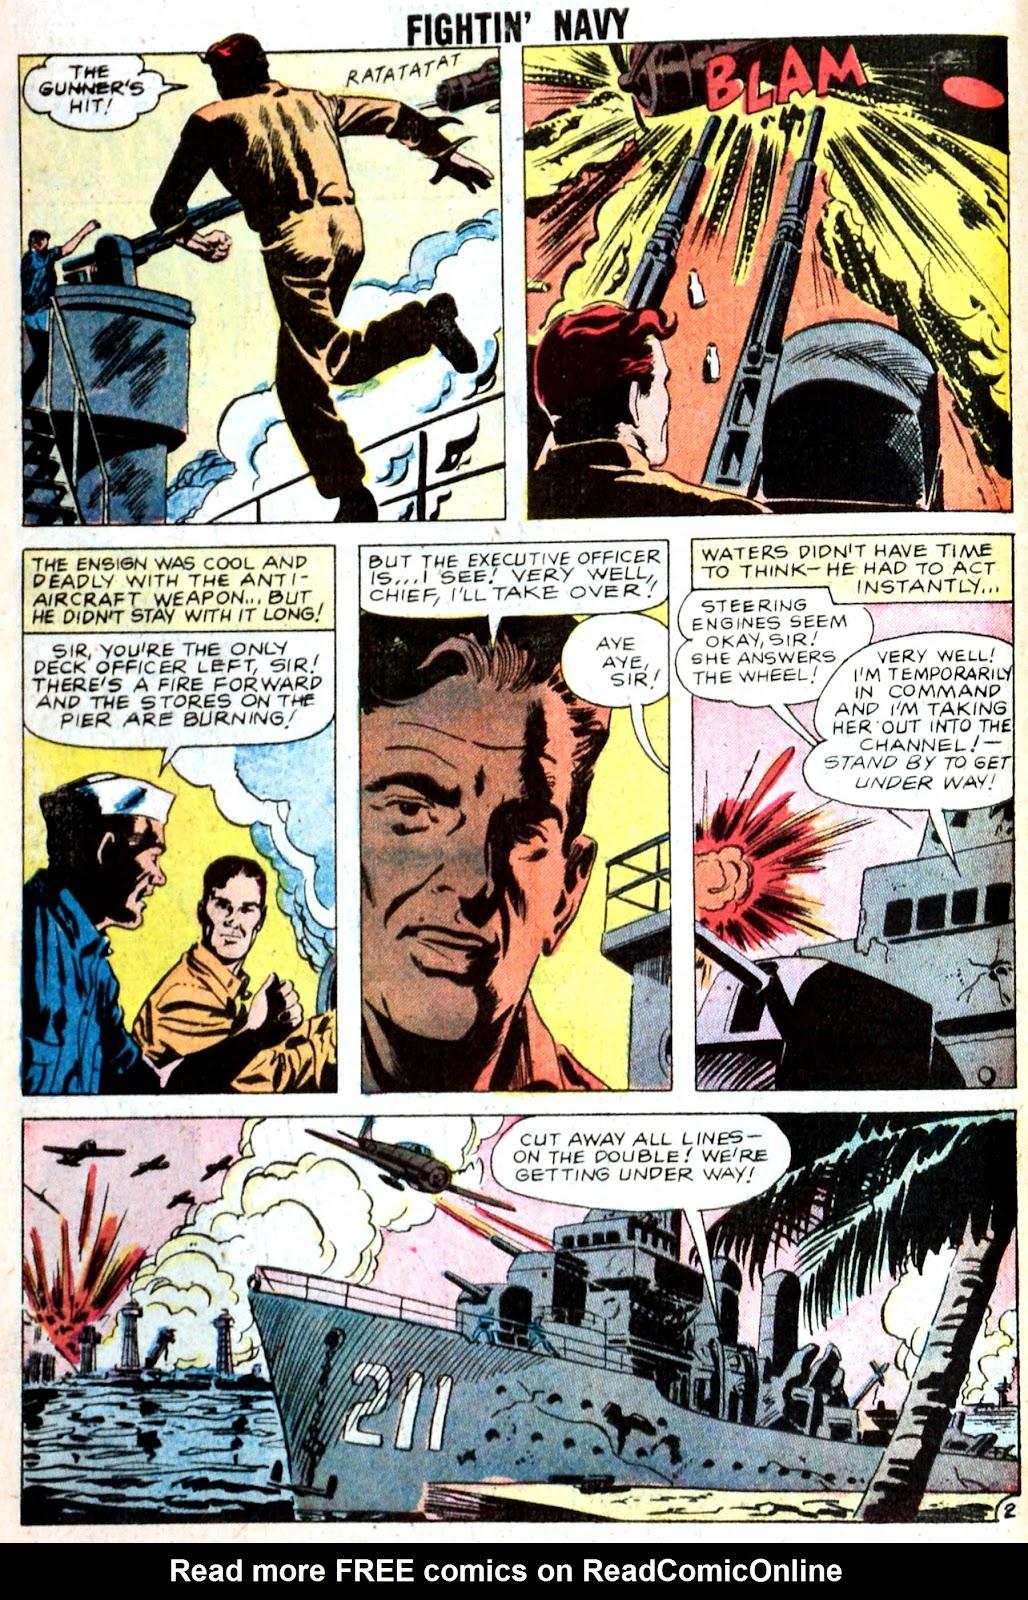 Read online Fightin' Navy comic -  Issue #85 - 10